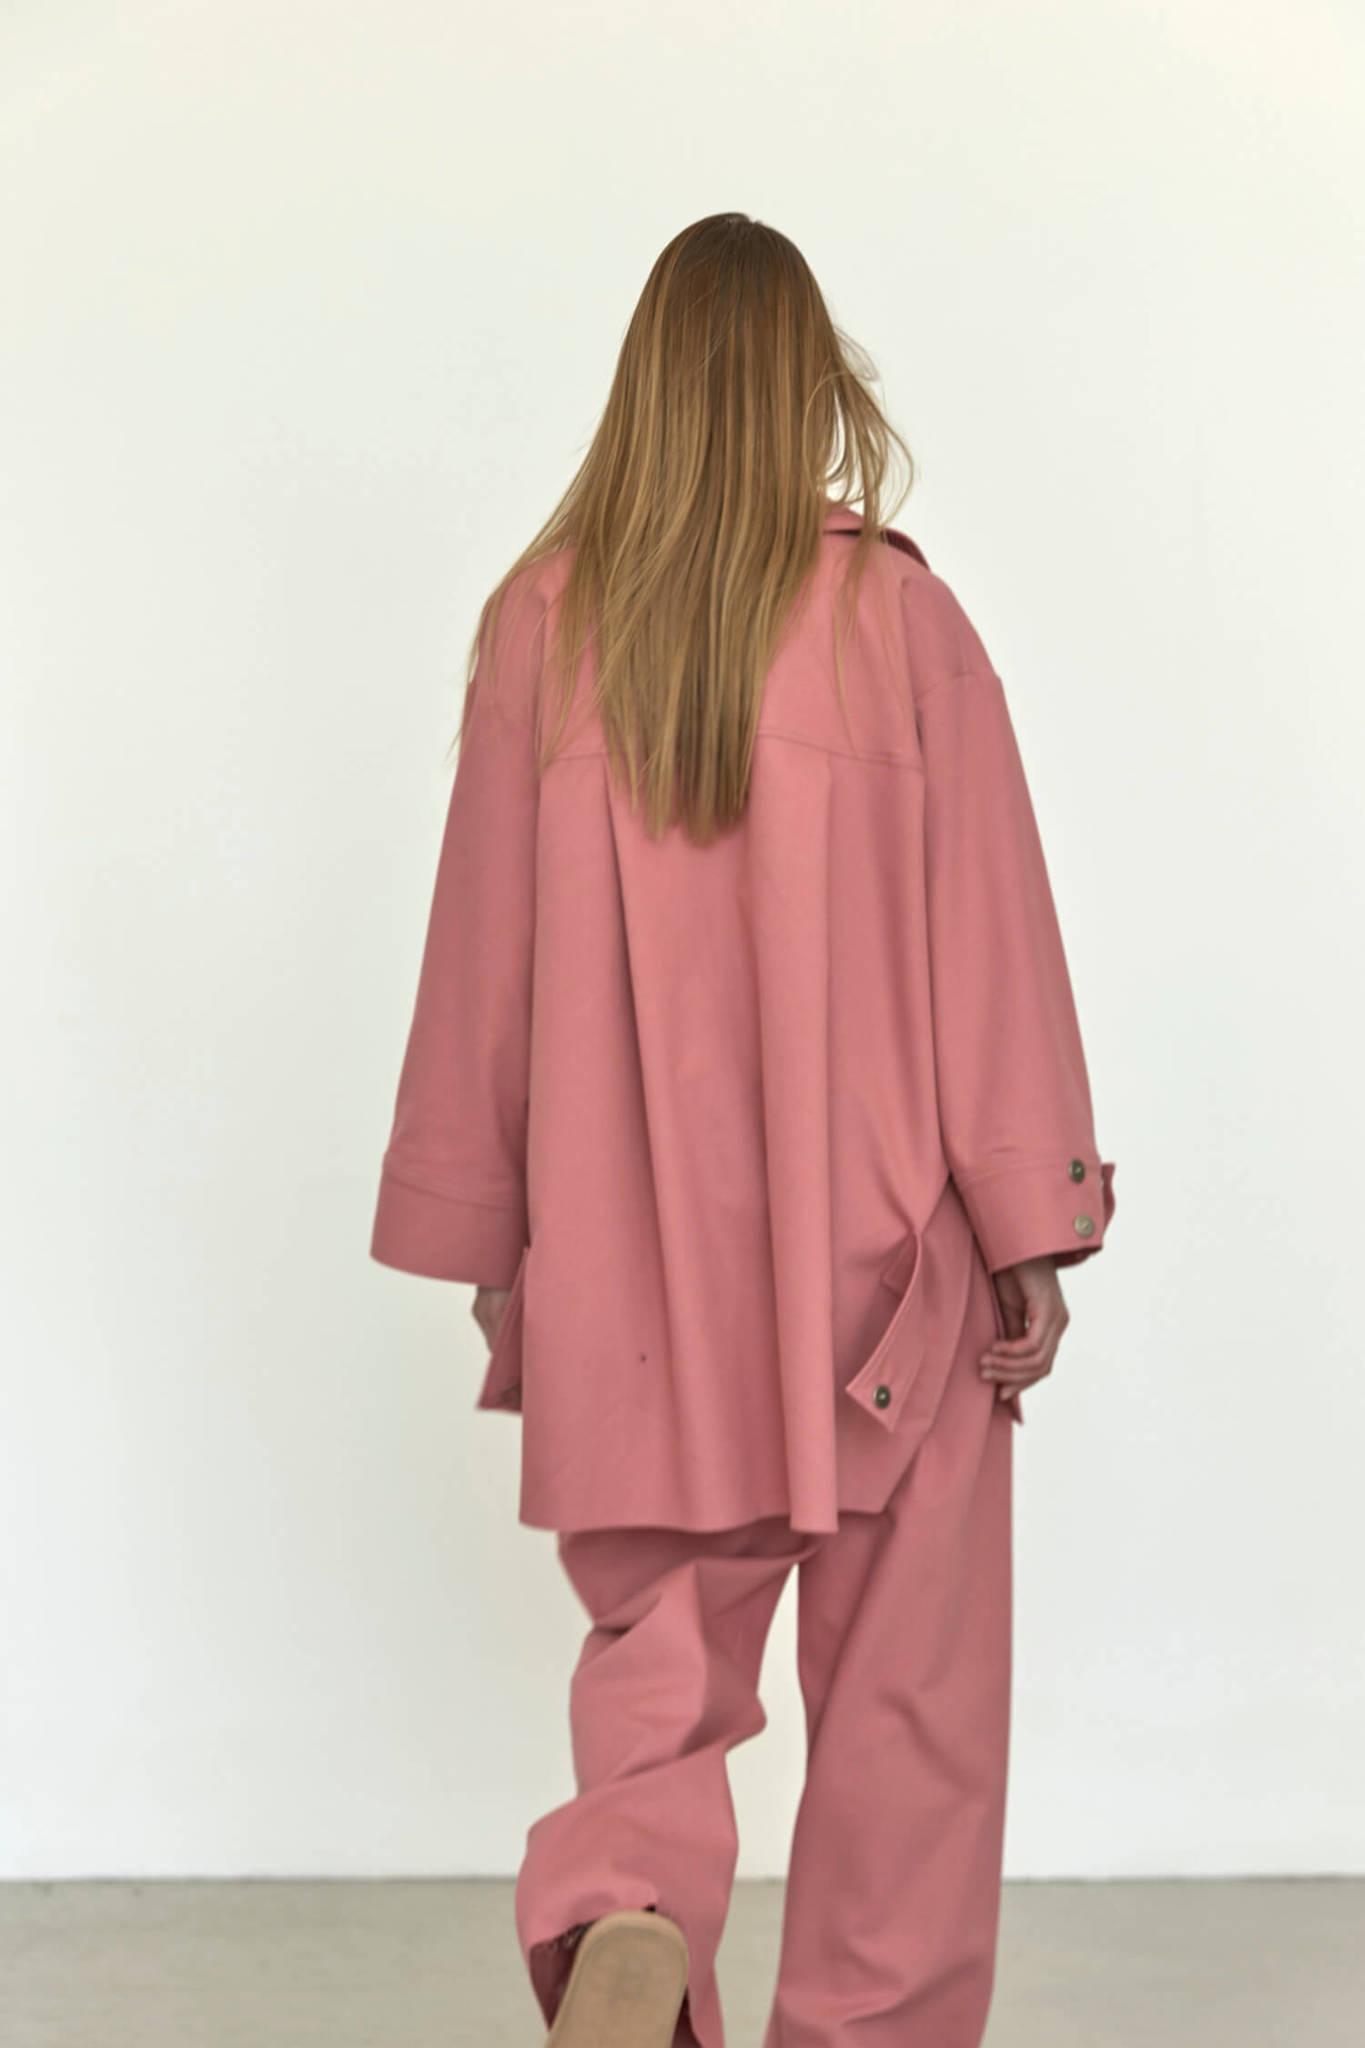 Куртка-рубашка на кнопках из денима, лососевая